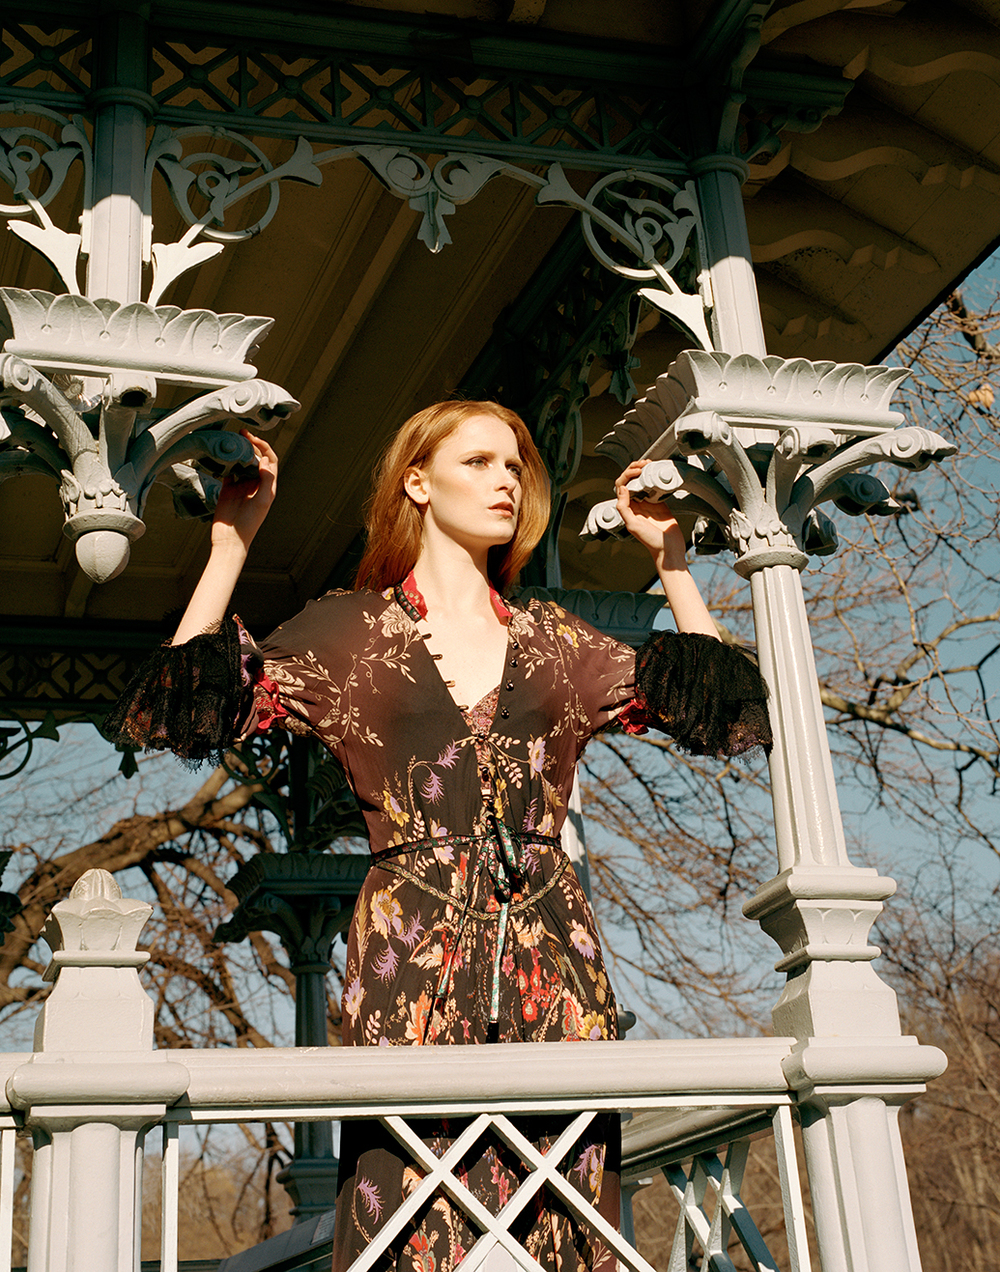 Photographer: Kacie Tomita  Model: Victoria Schons  Hair: Janine Parrella  Designer: Gucci